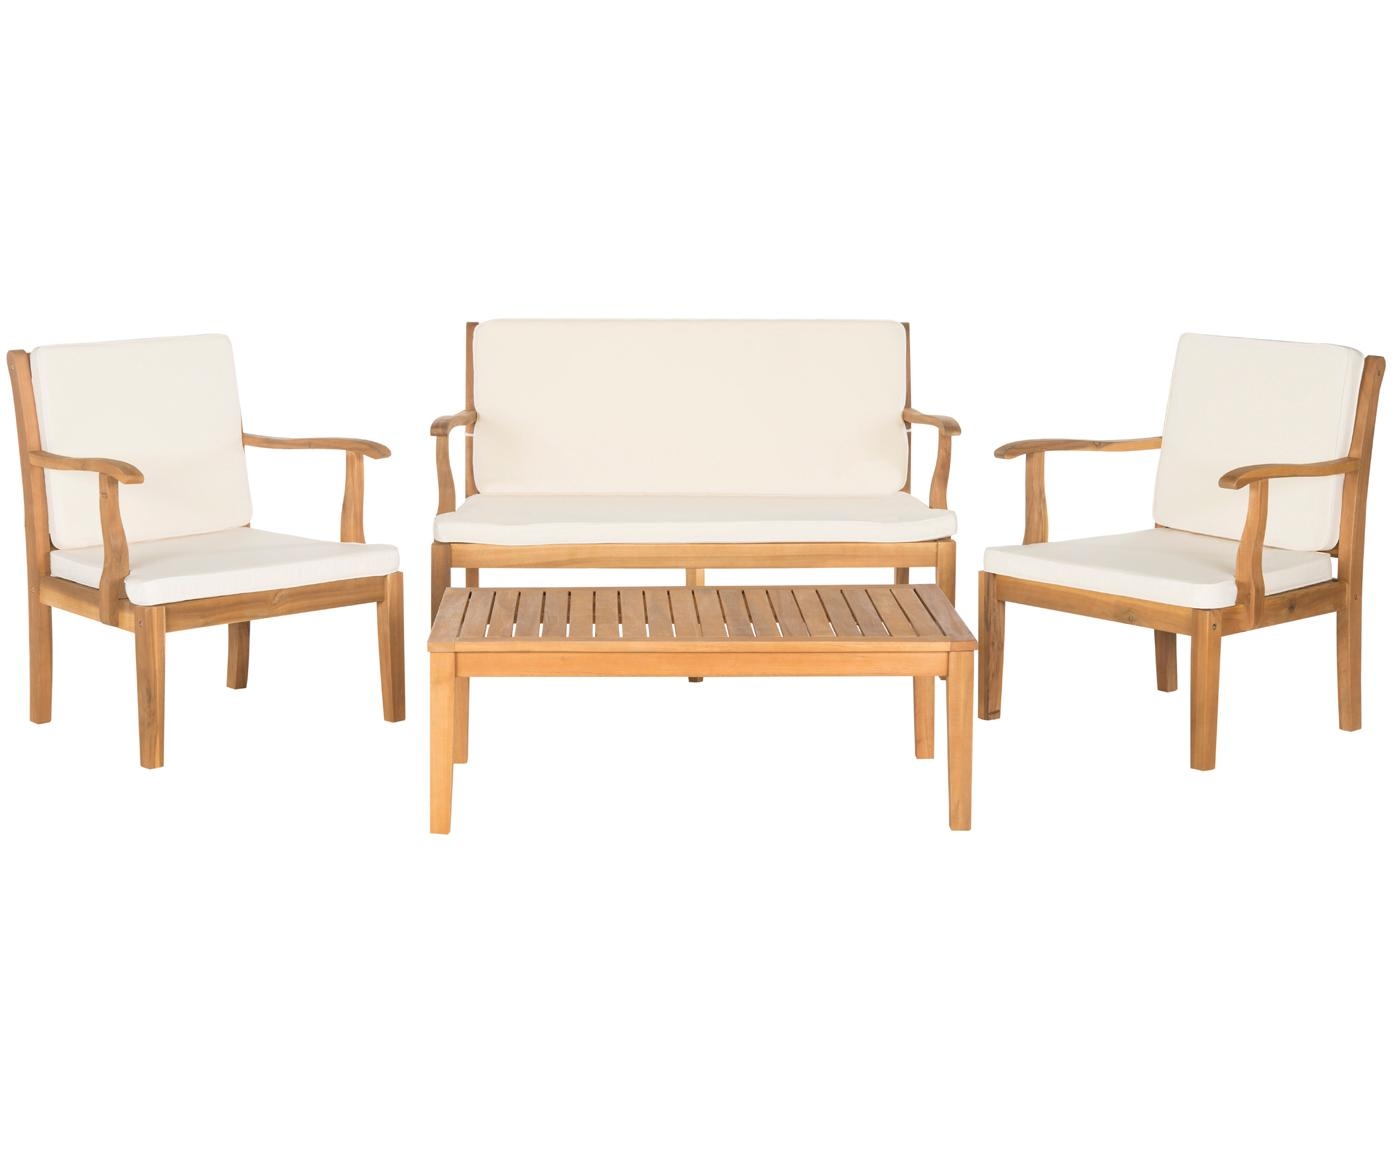 Outdoor meubelset Lugano, 4-delig., Bekleding: 100 % polyester, Acaciahout, ecru, Verschillende formaten